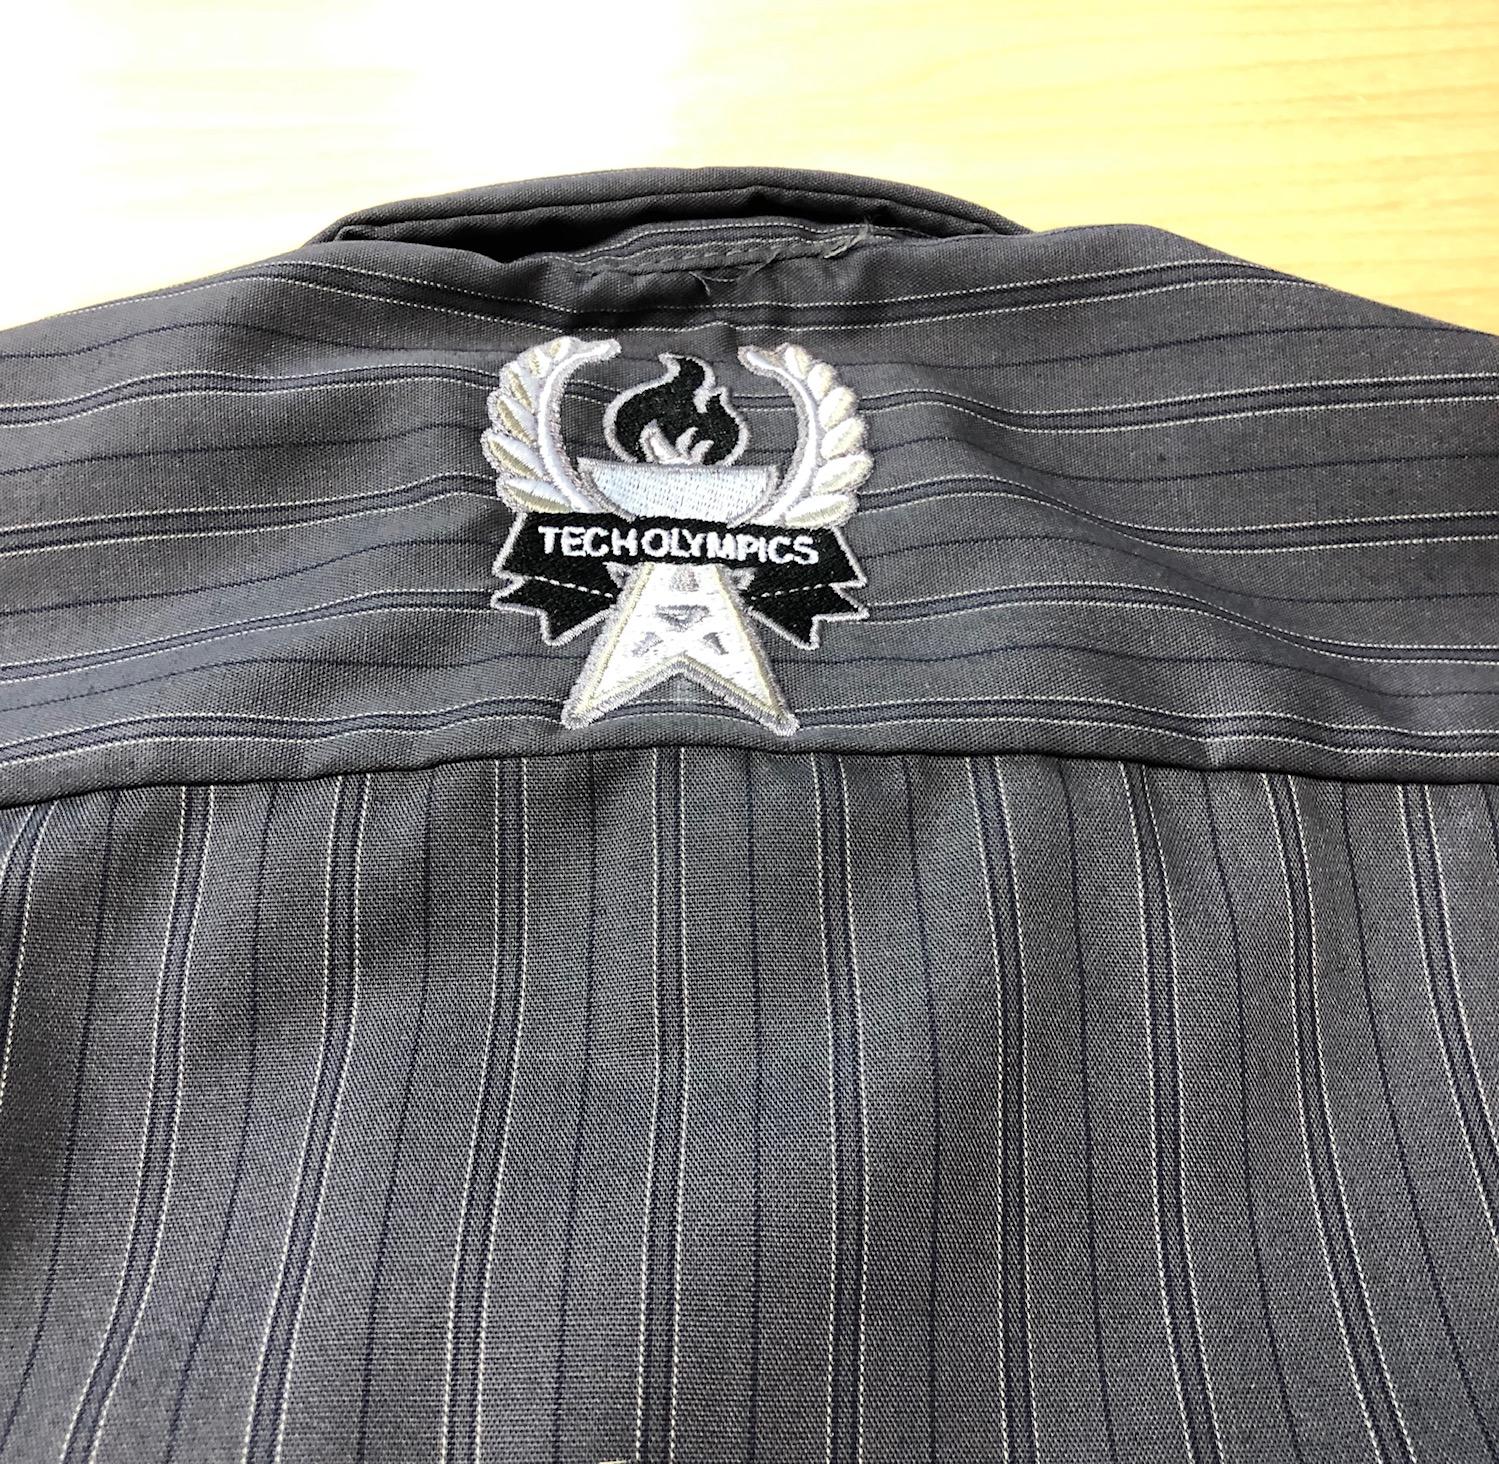 logounltd_laser_etching_embroidery_screen_printing_apparel_uniform_custom_tshirts_kirkland_bellevue_seattle_redmond_woodinville_branded_merchandise_promotional_products_logo_unltd_ tshirts_design_custom (6).jpg